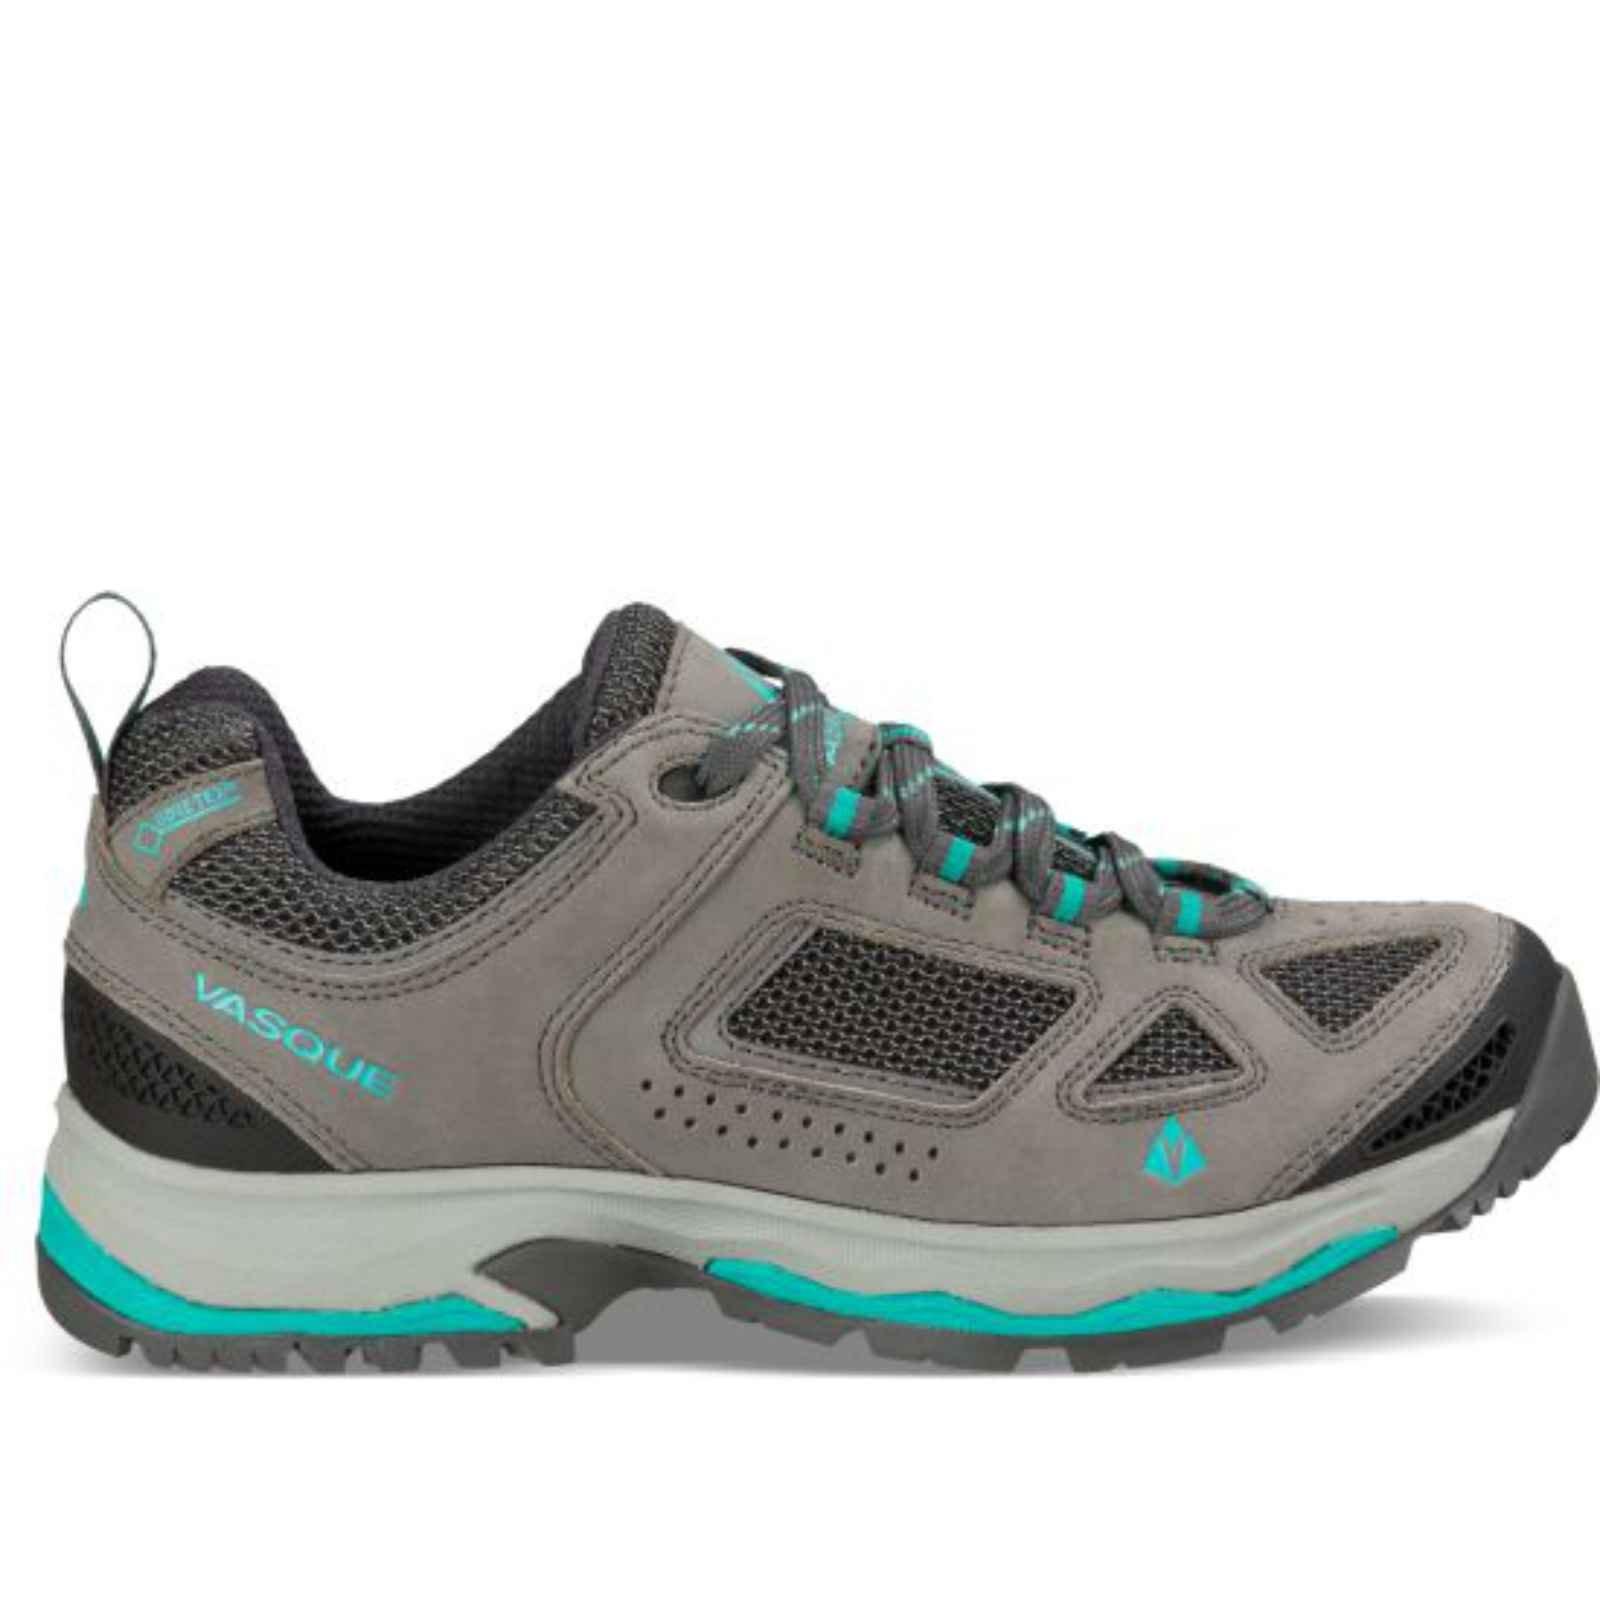 Vasque Breeze III Low GTX Hiking Boots Womens, Gargoyle/Columbia, 10.5 US, 07197M 07197M 105 by Vasque (Image #1)